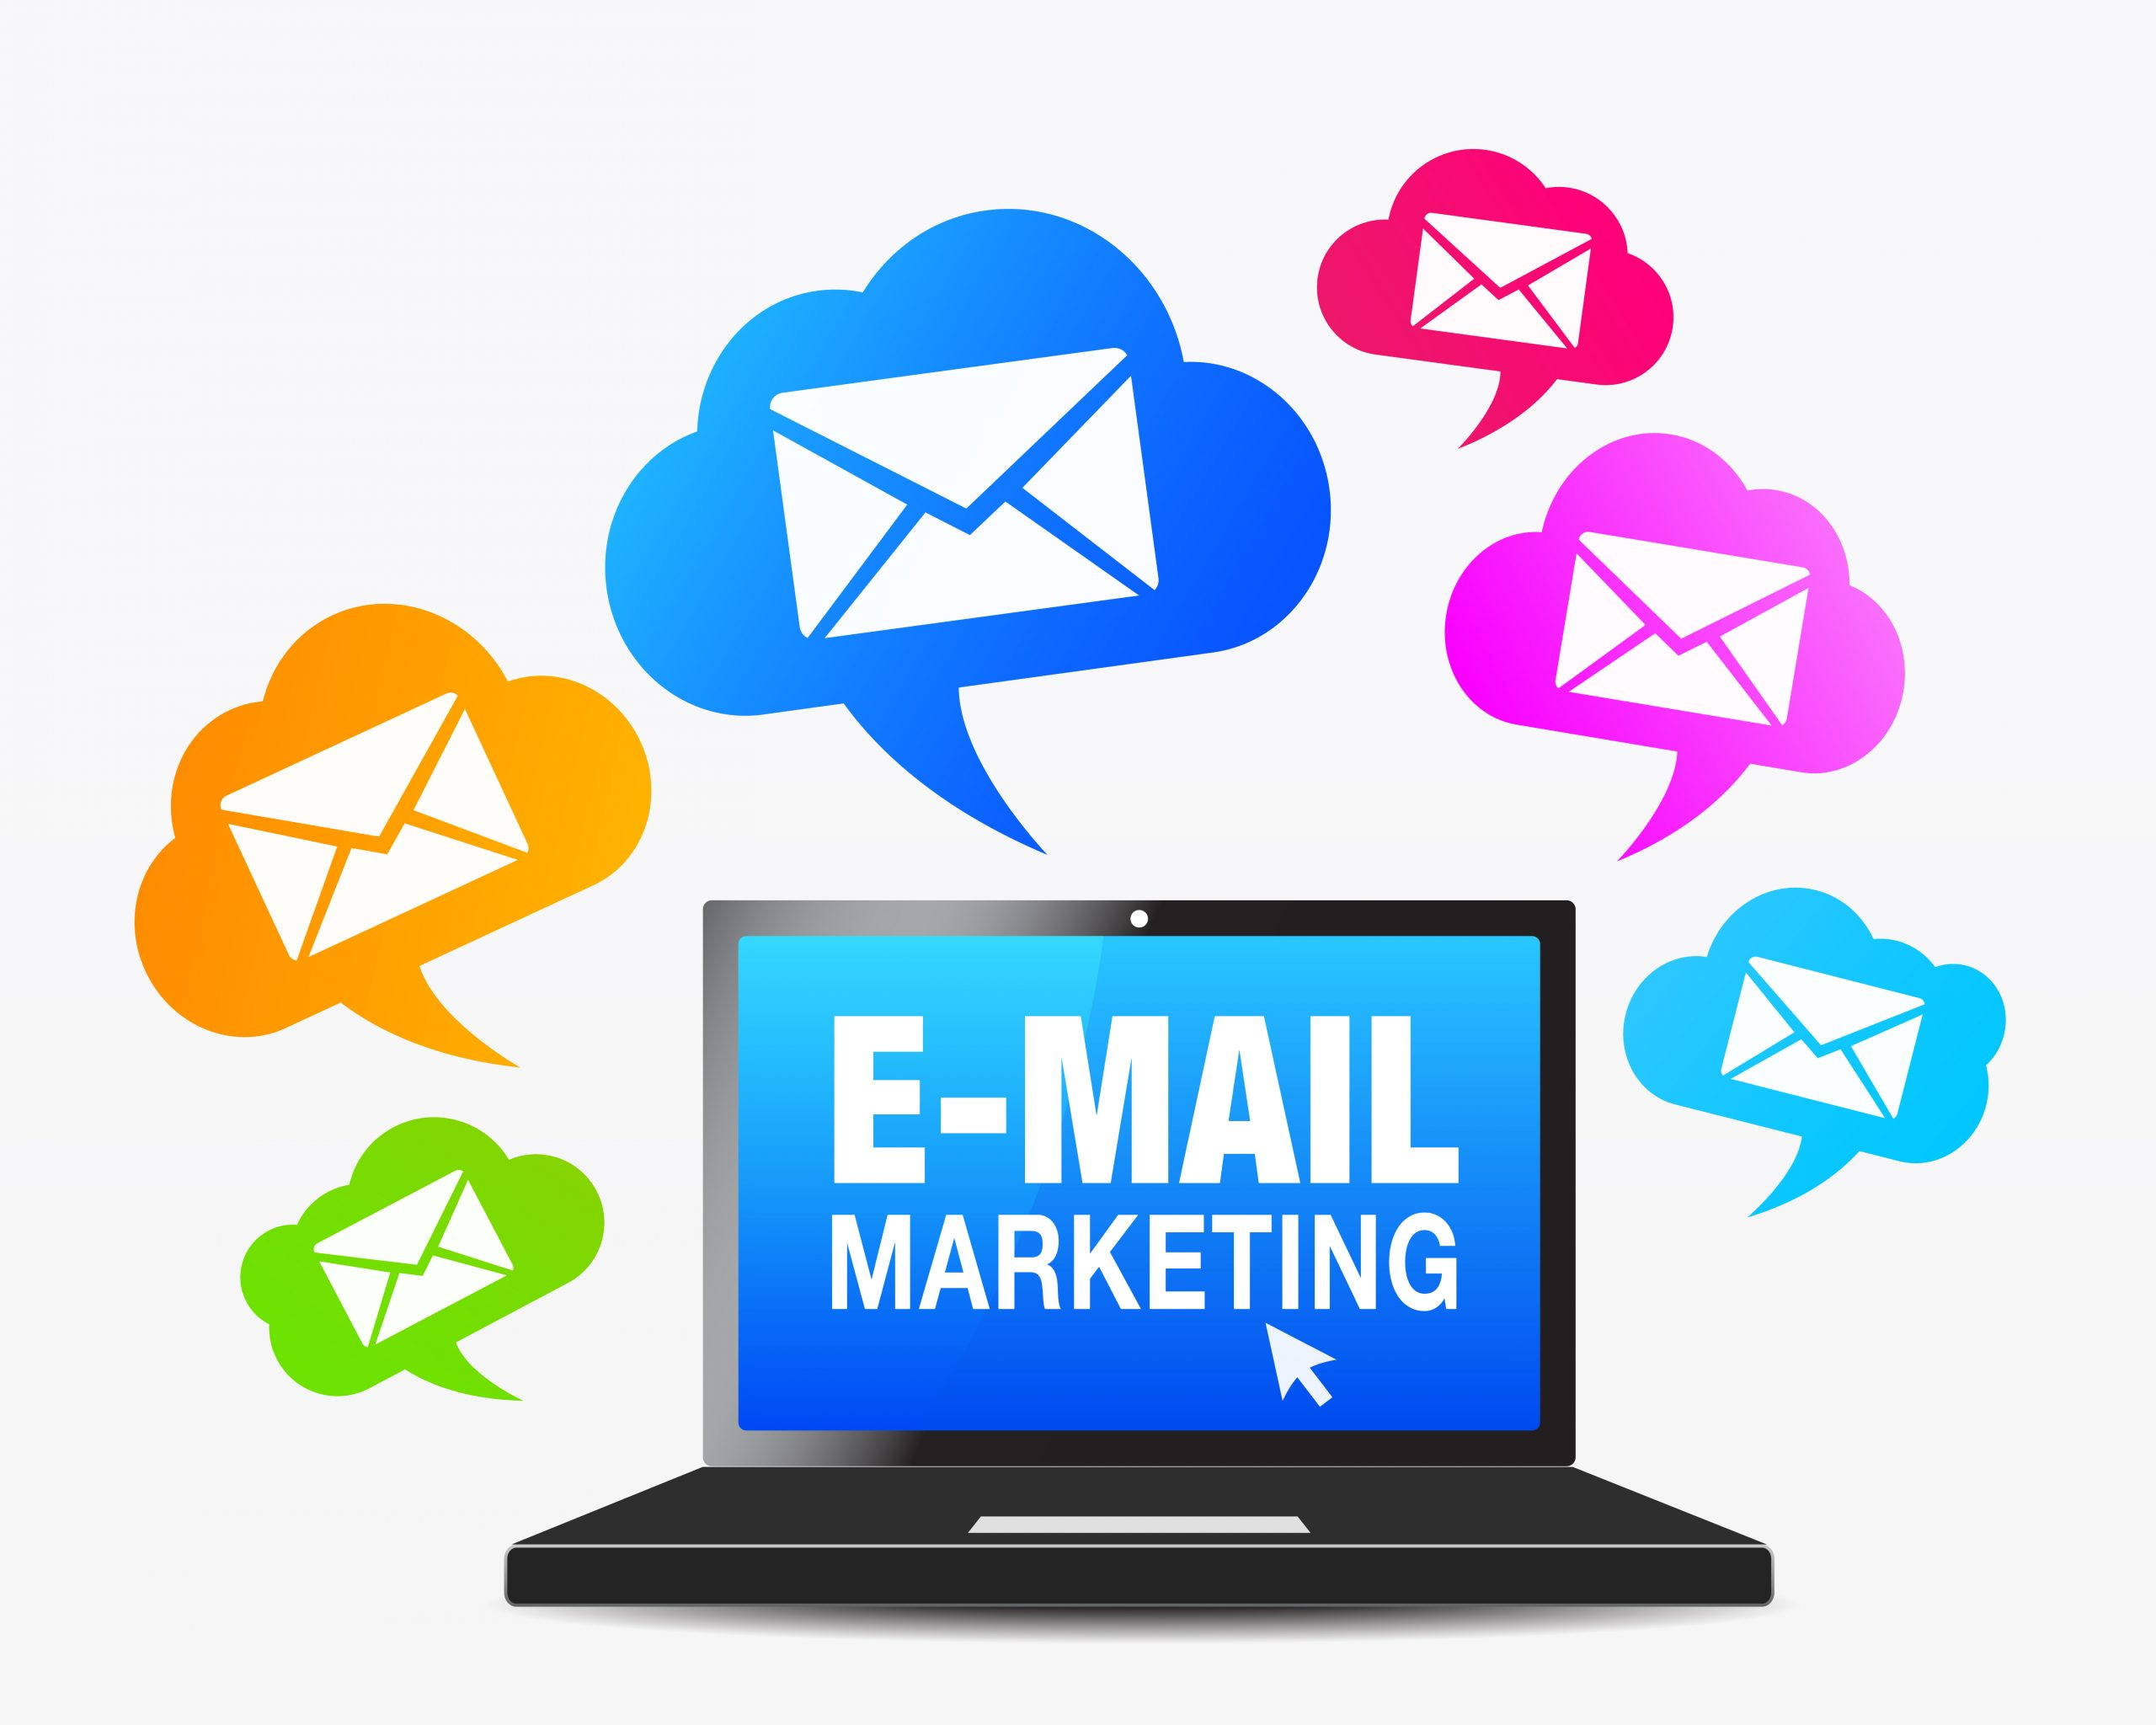 Le Top 11 des logiciels d'emailing, des logiciels d'emailing gratuits aux solutions d'emailing les plus performantes ! 26